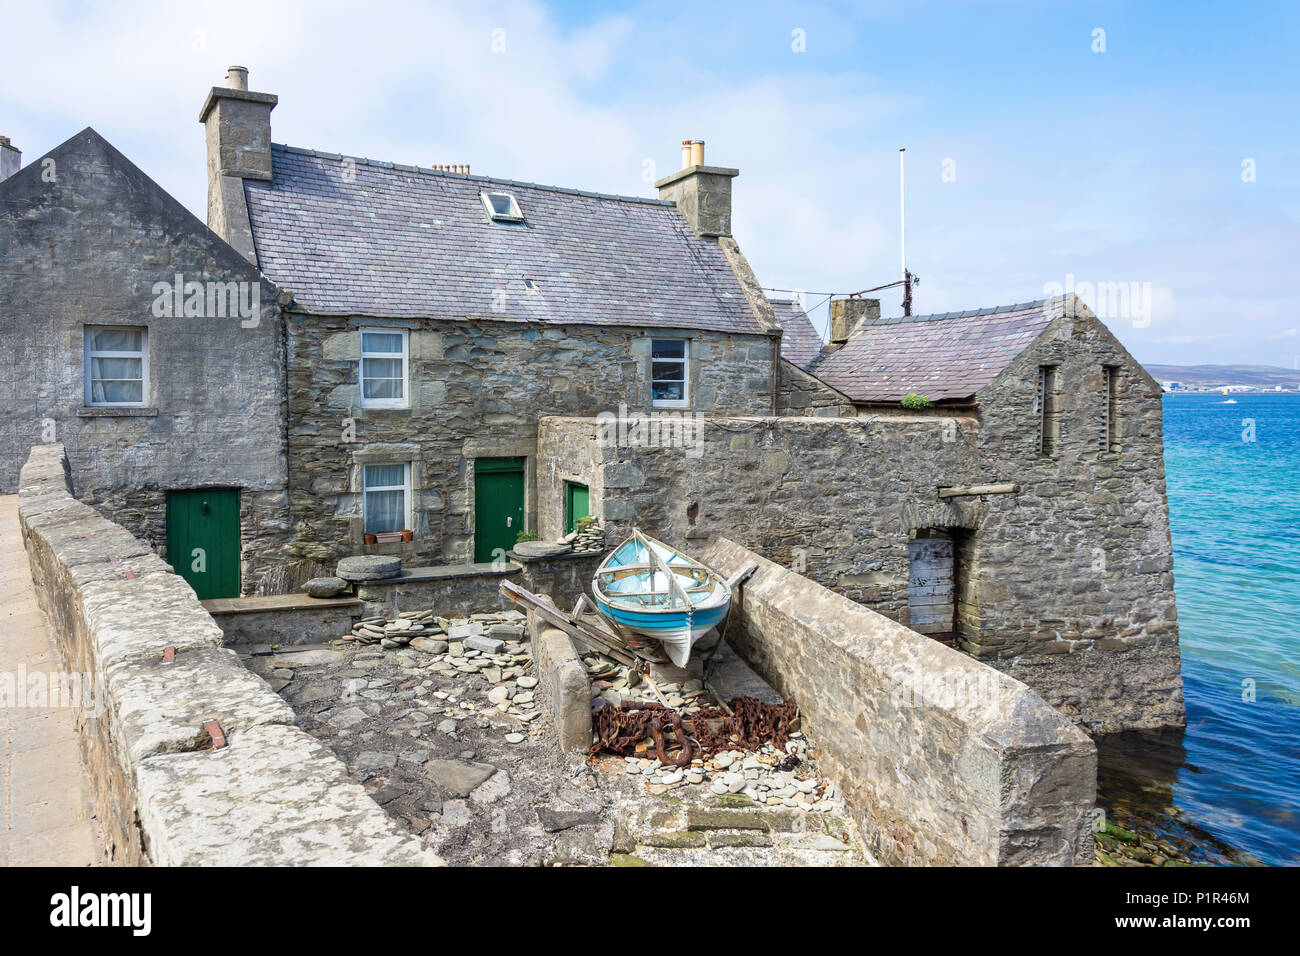 Stone cottage in harbour (Jimmy Perez house in TV Shetland series), Lerwick, Shetland, Northern Isles, Scotland, United Kingdom - Stock Image